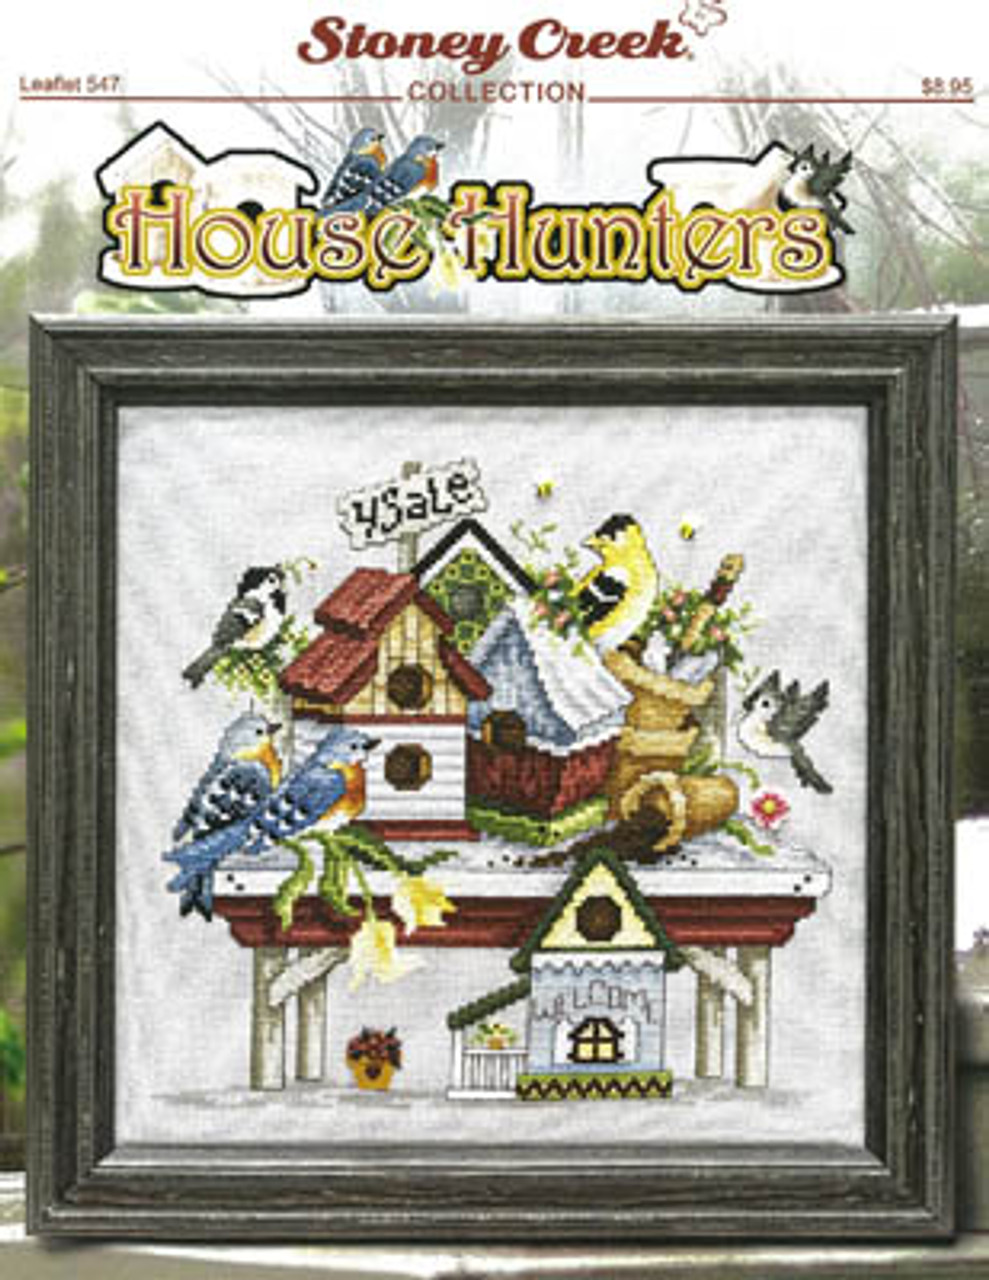 House Hunters / Stoney Creek